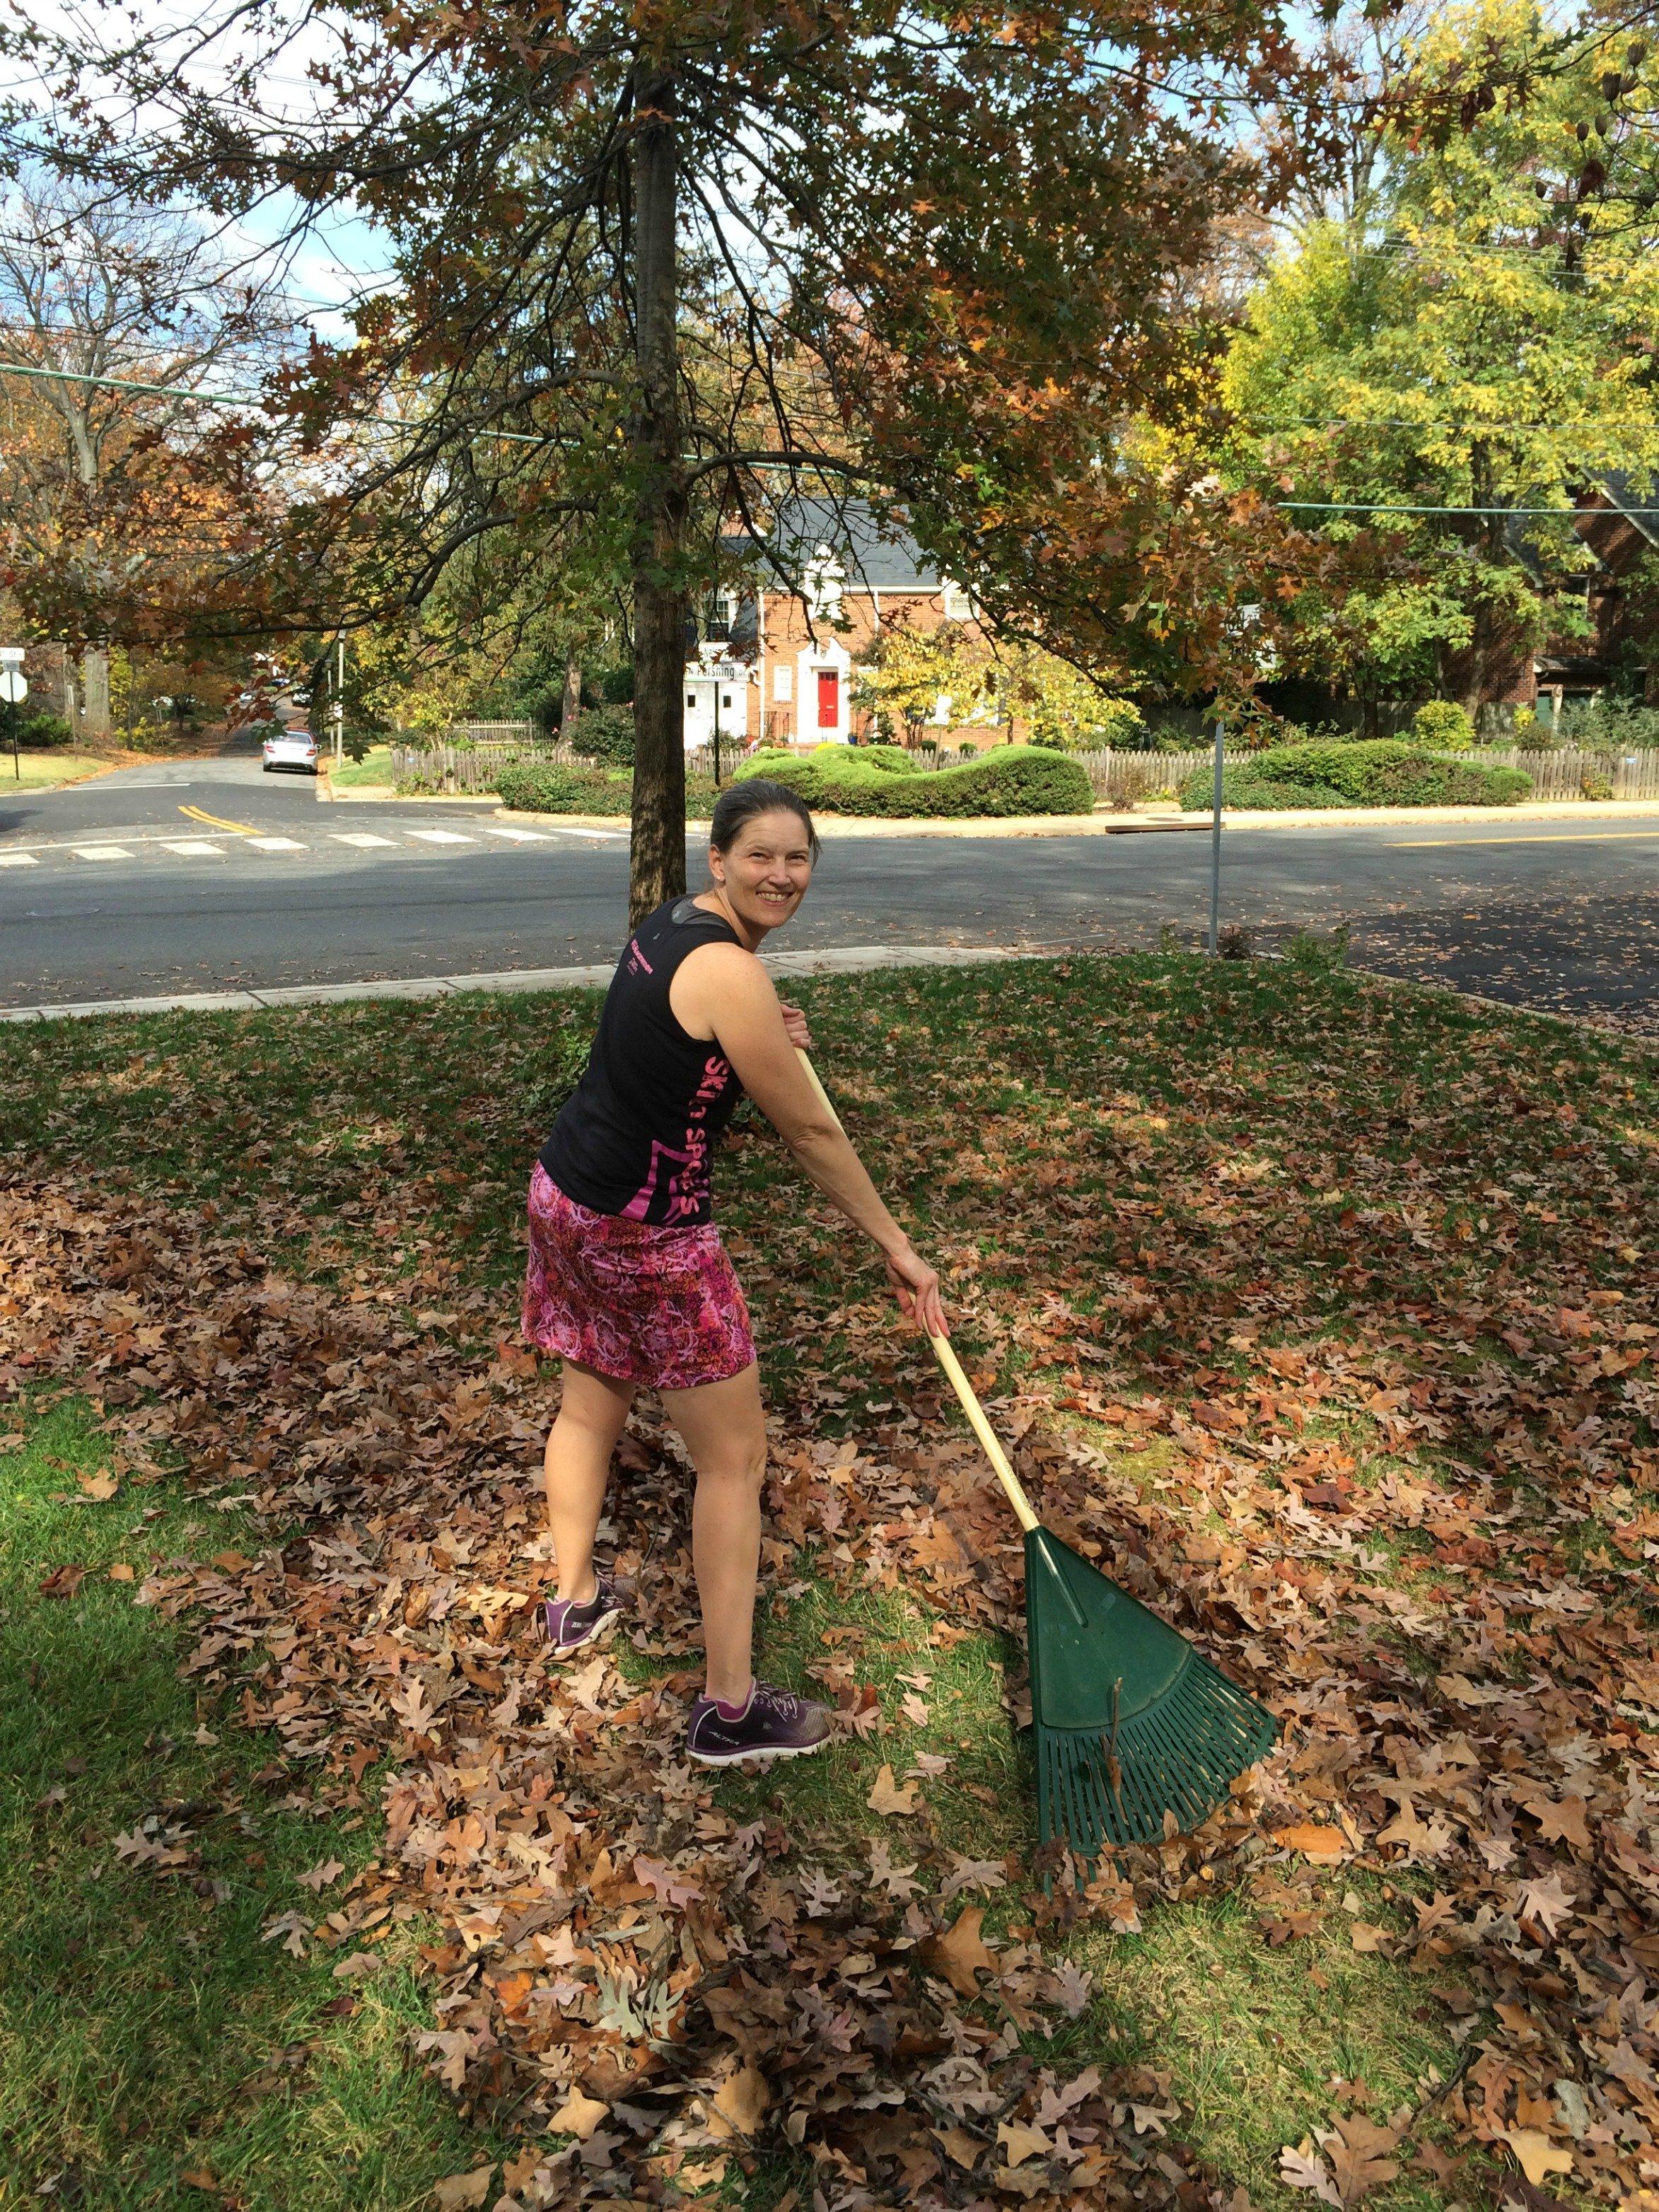 Skirt Sports leaf raking